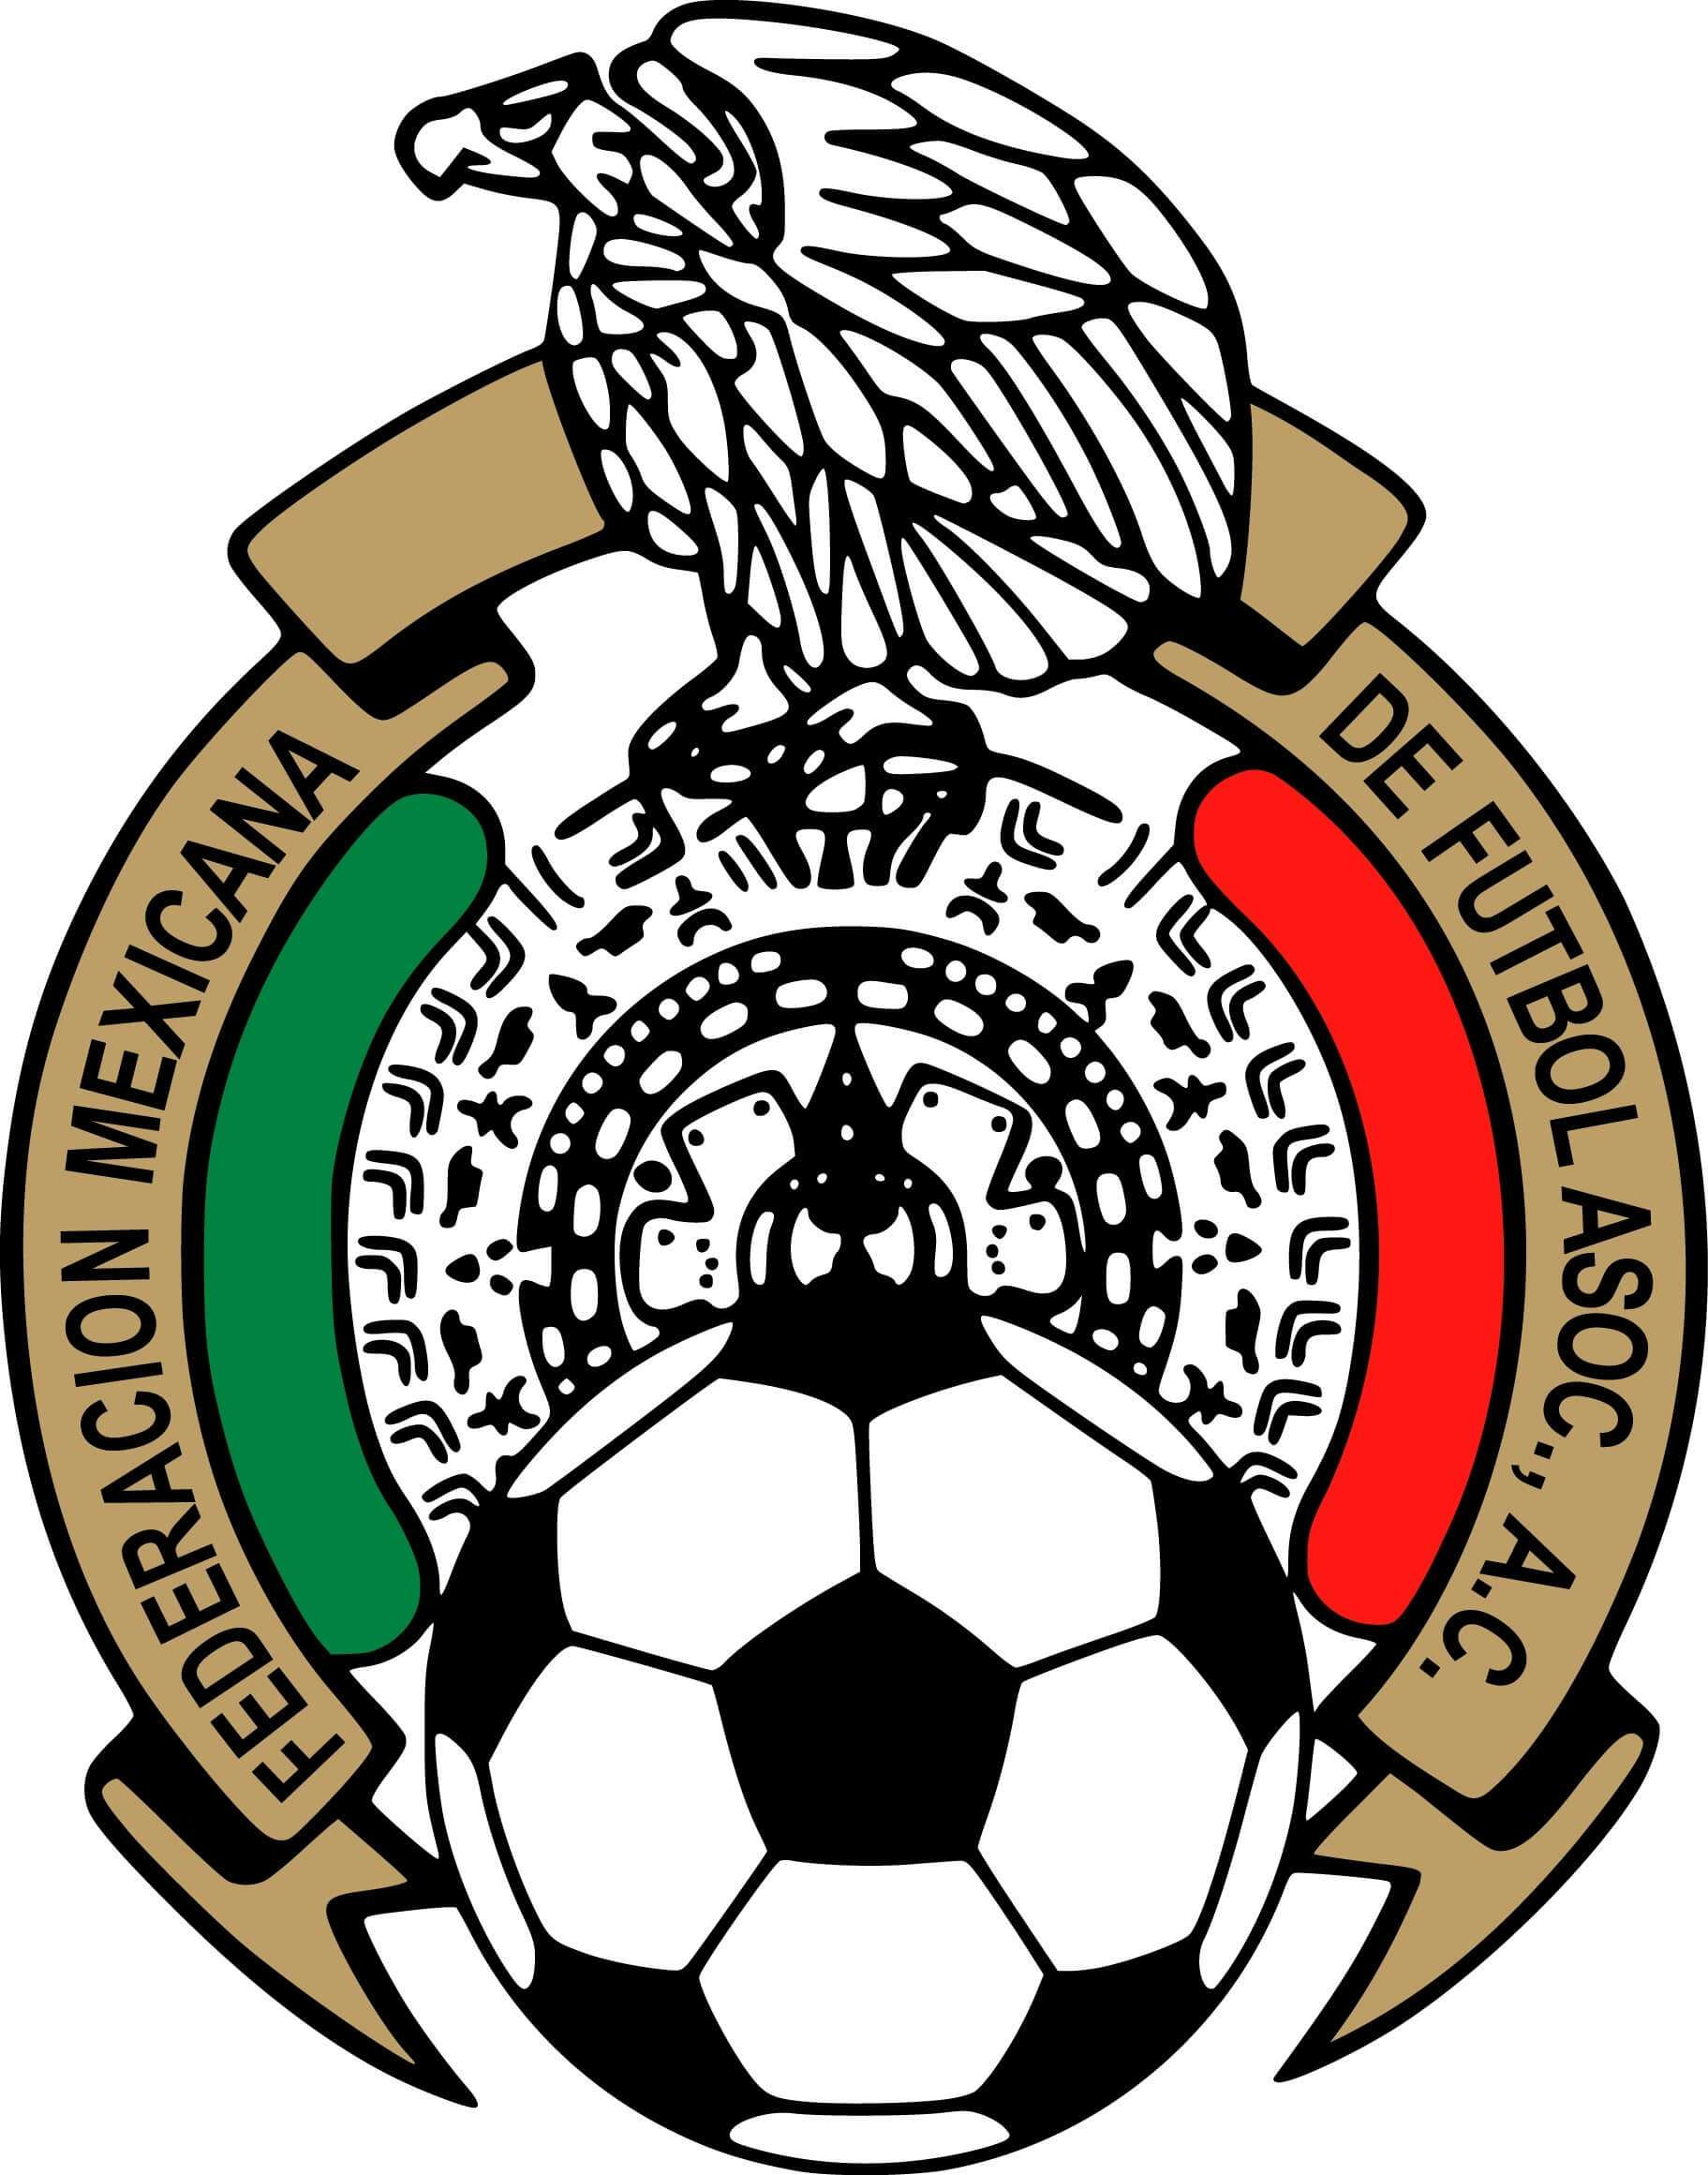 Mexico-national-football-team-and-Federation-of-Association-Football-logo